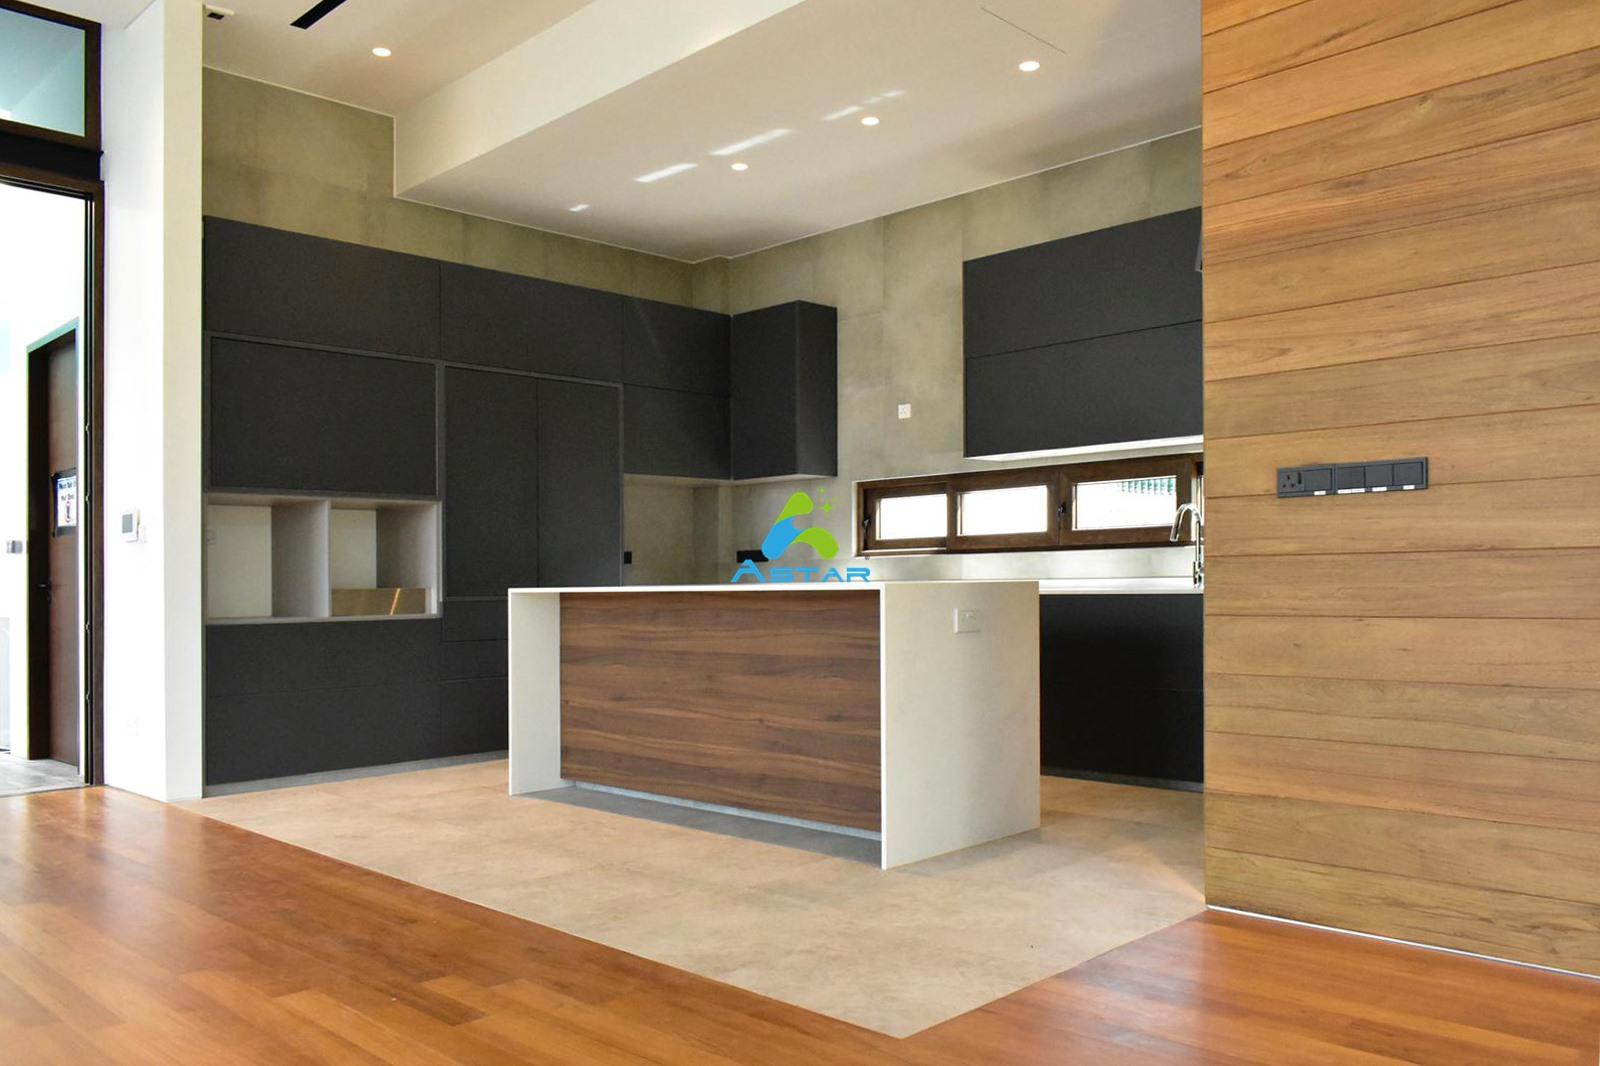 astar furnishing complete projects aluminium kitchen cabinet vanity cabinet wardrobe gardenia road 01